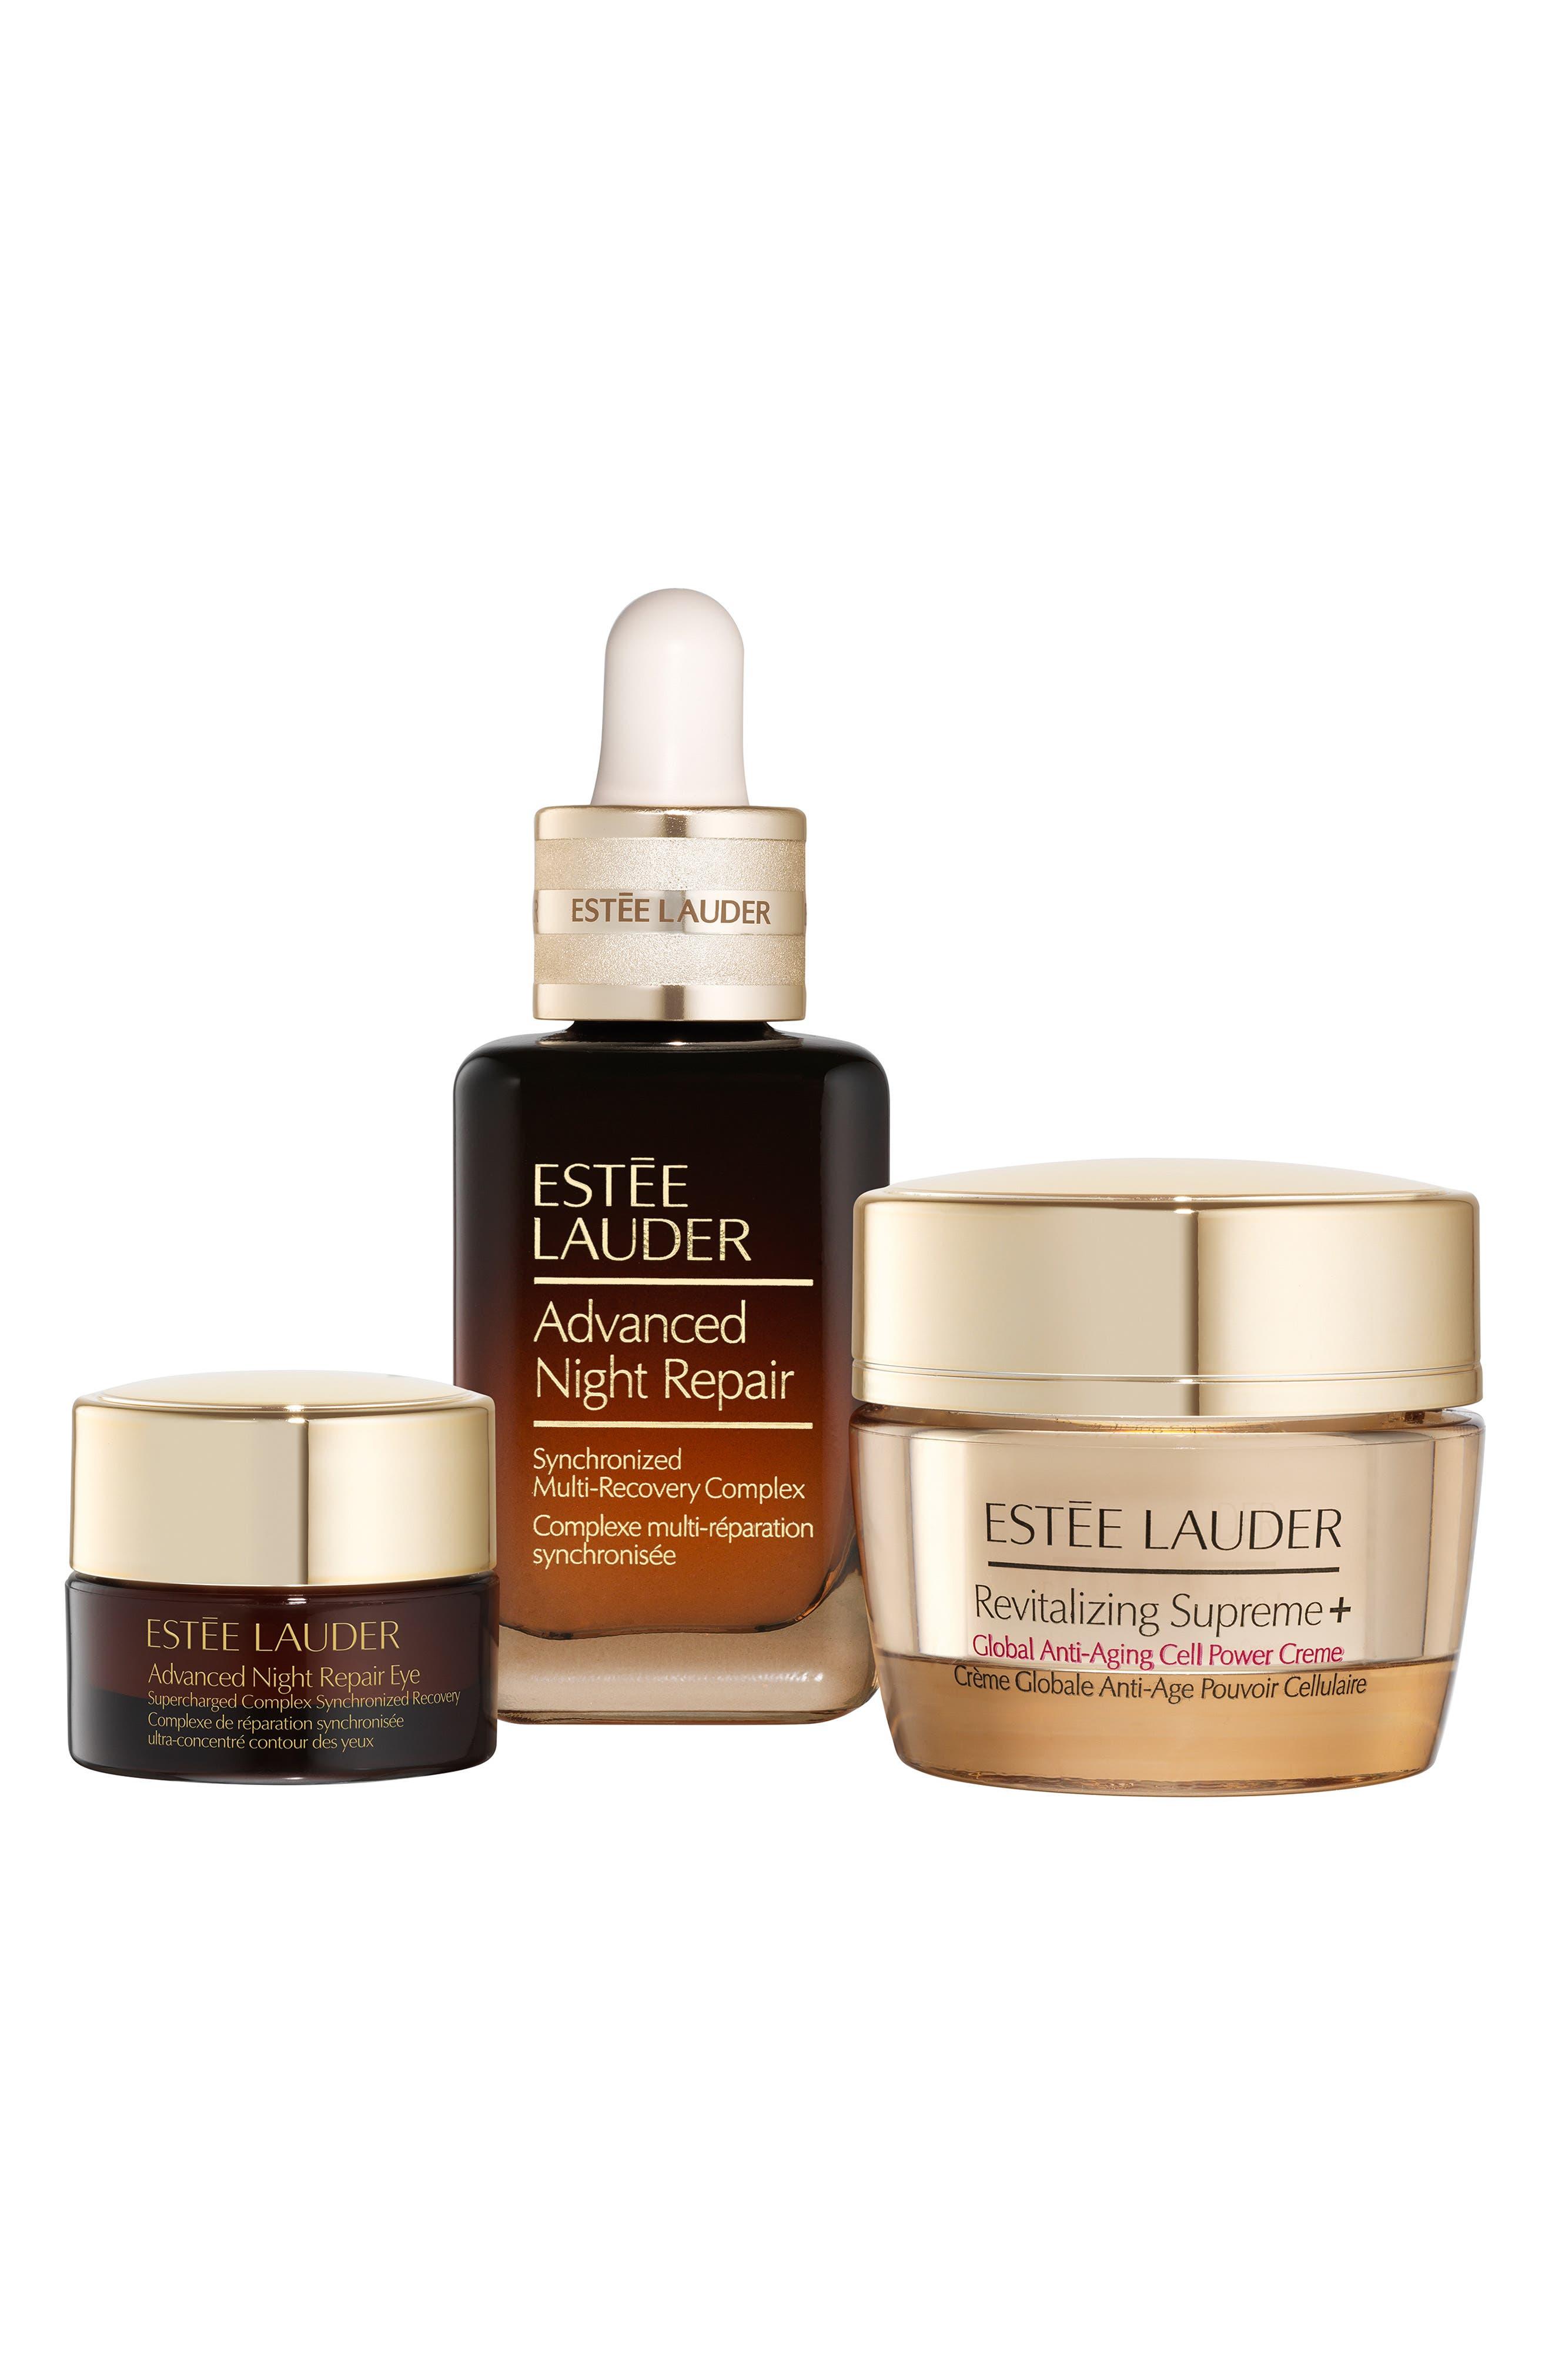 Estee Lauder Radiant Skin Repair Renew Set Nordstrom